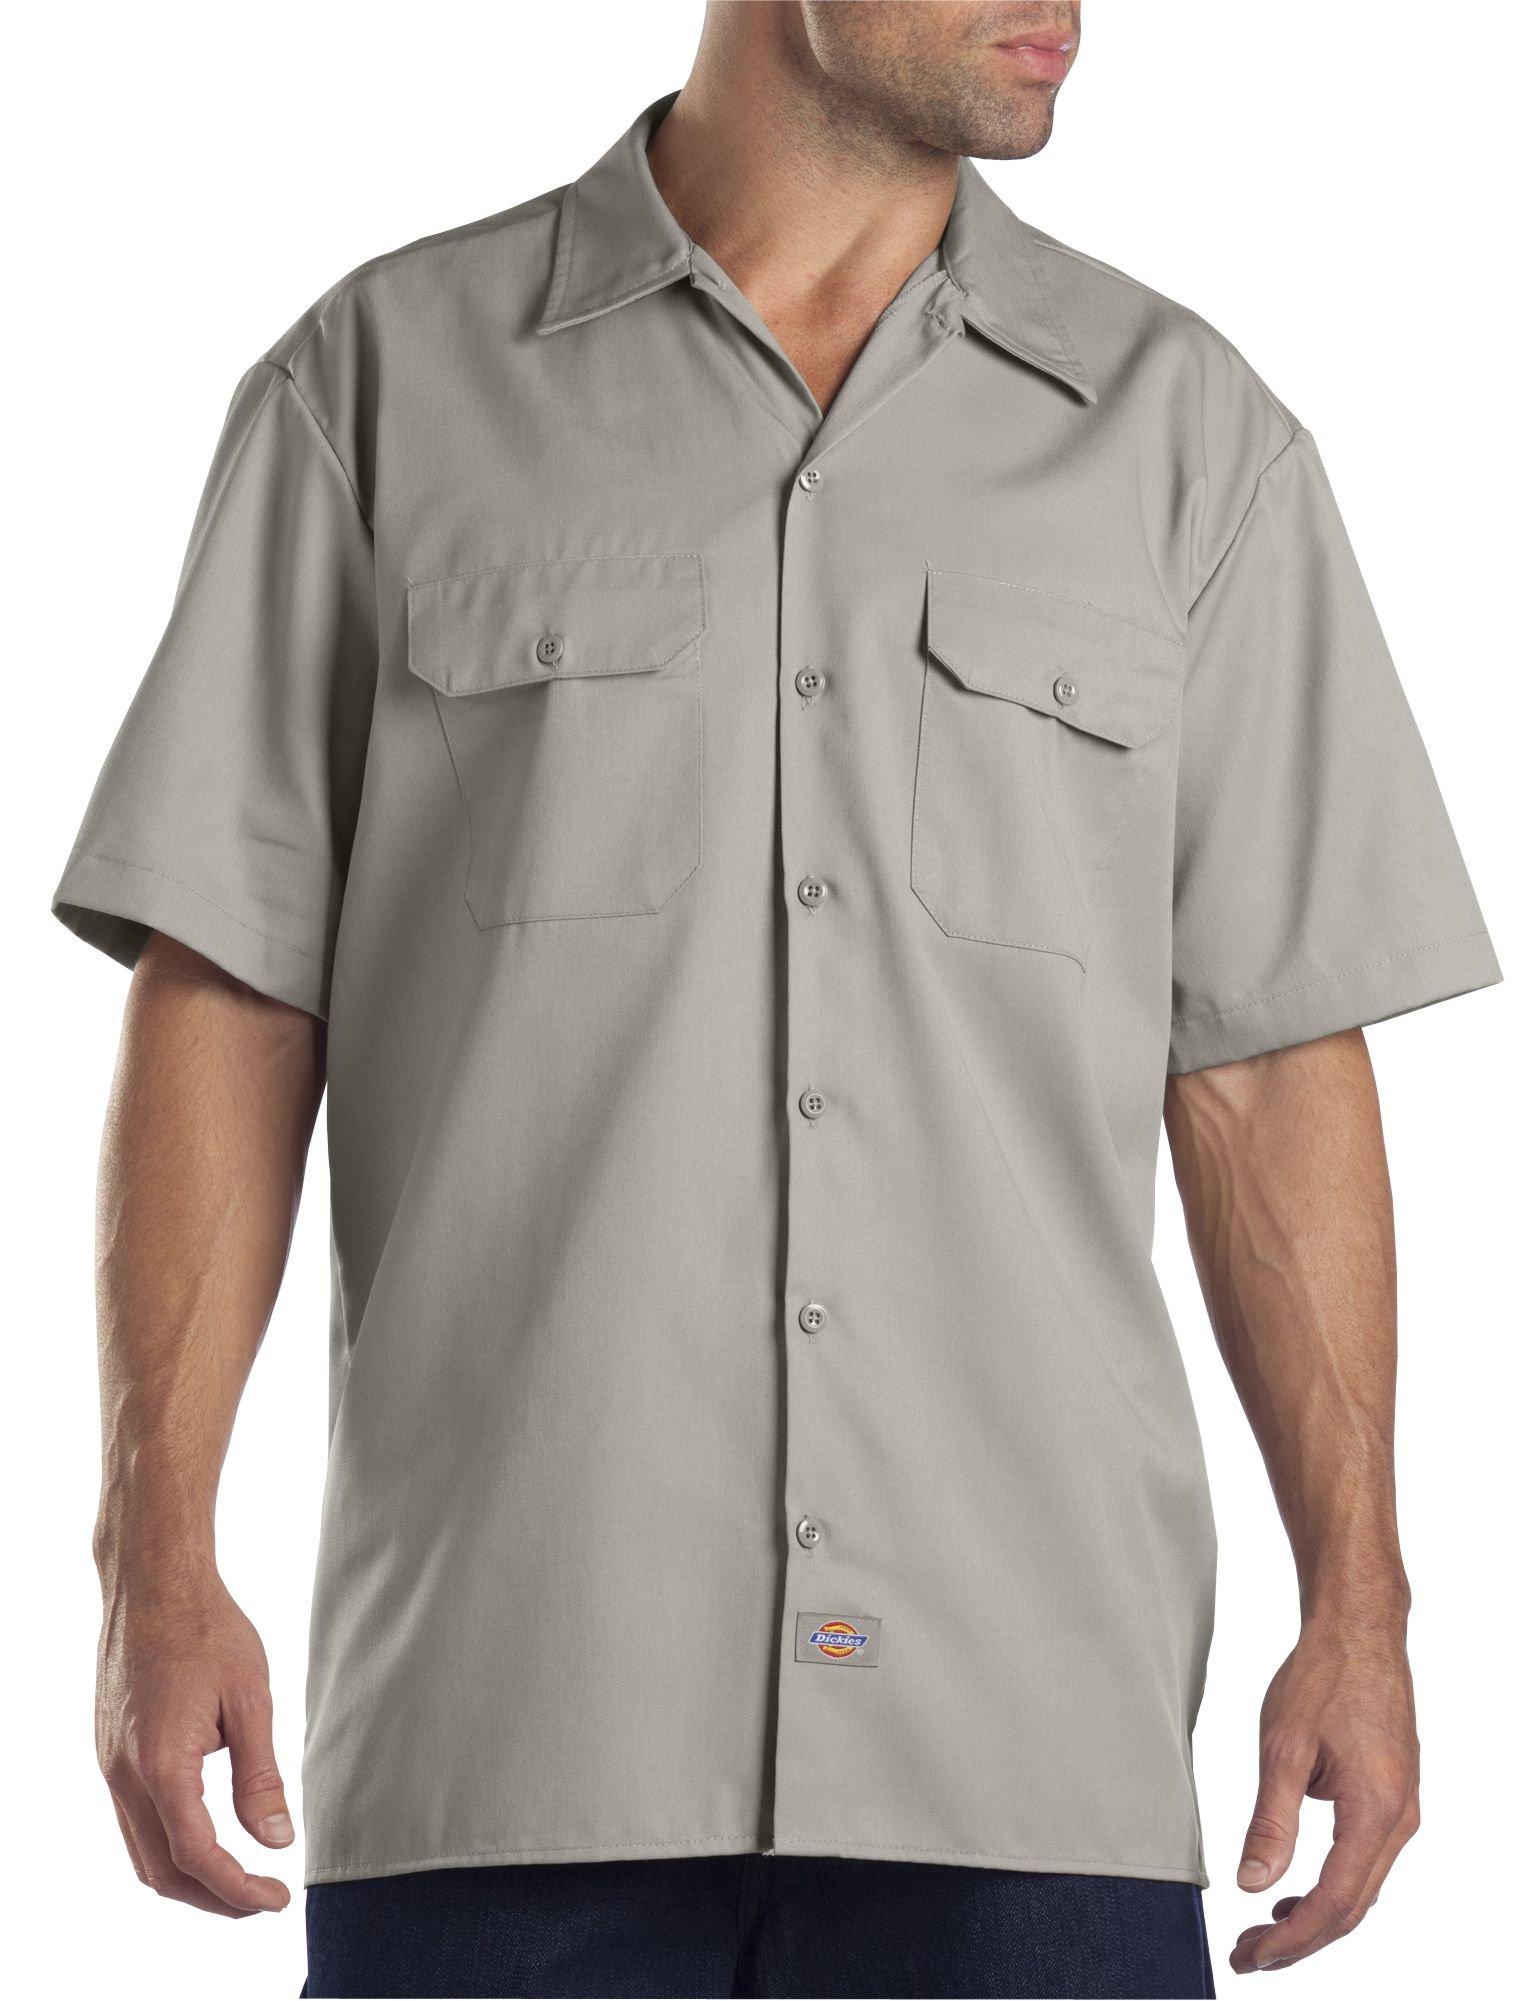 Dickies Men's Short-Sleeve Work Shirt, Silver Gray, 2X-Large